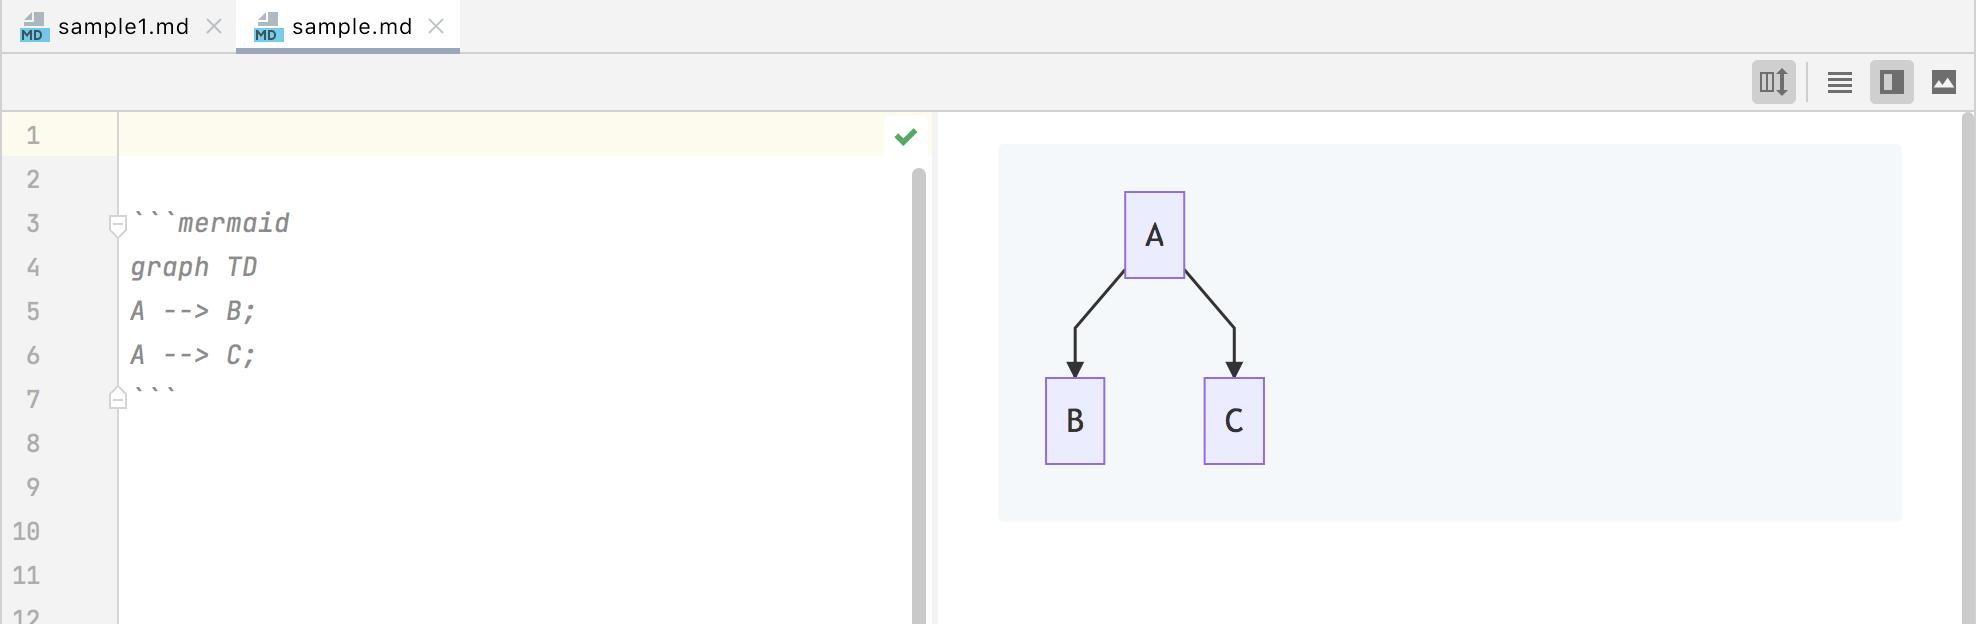 PlantUML diagrams in markdown